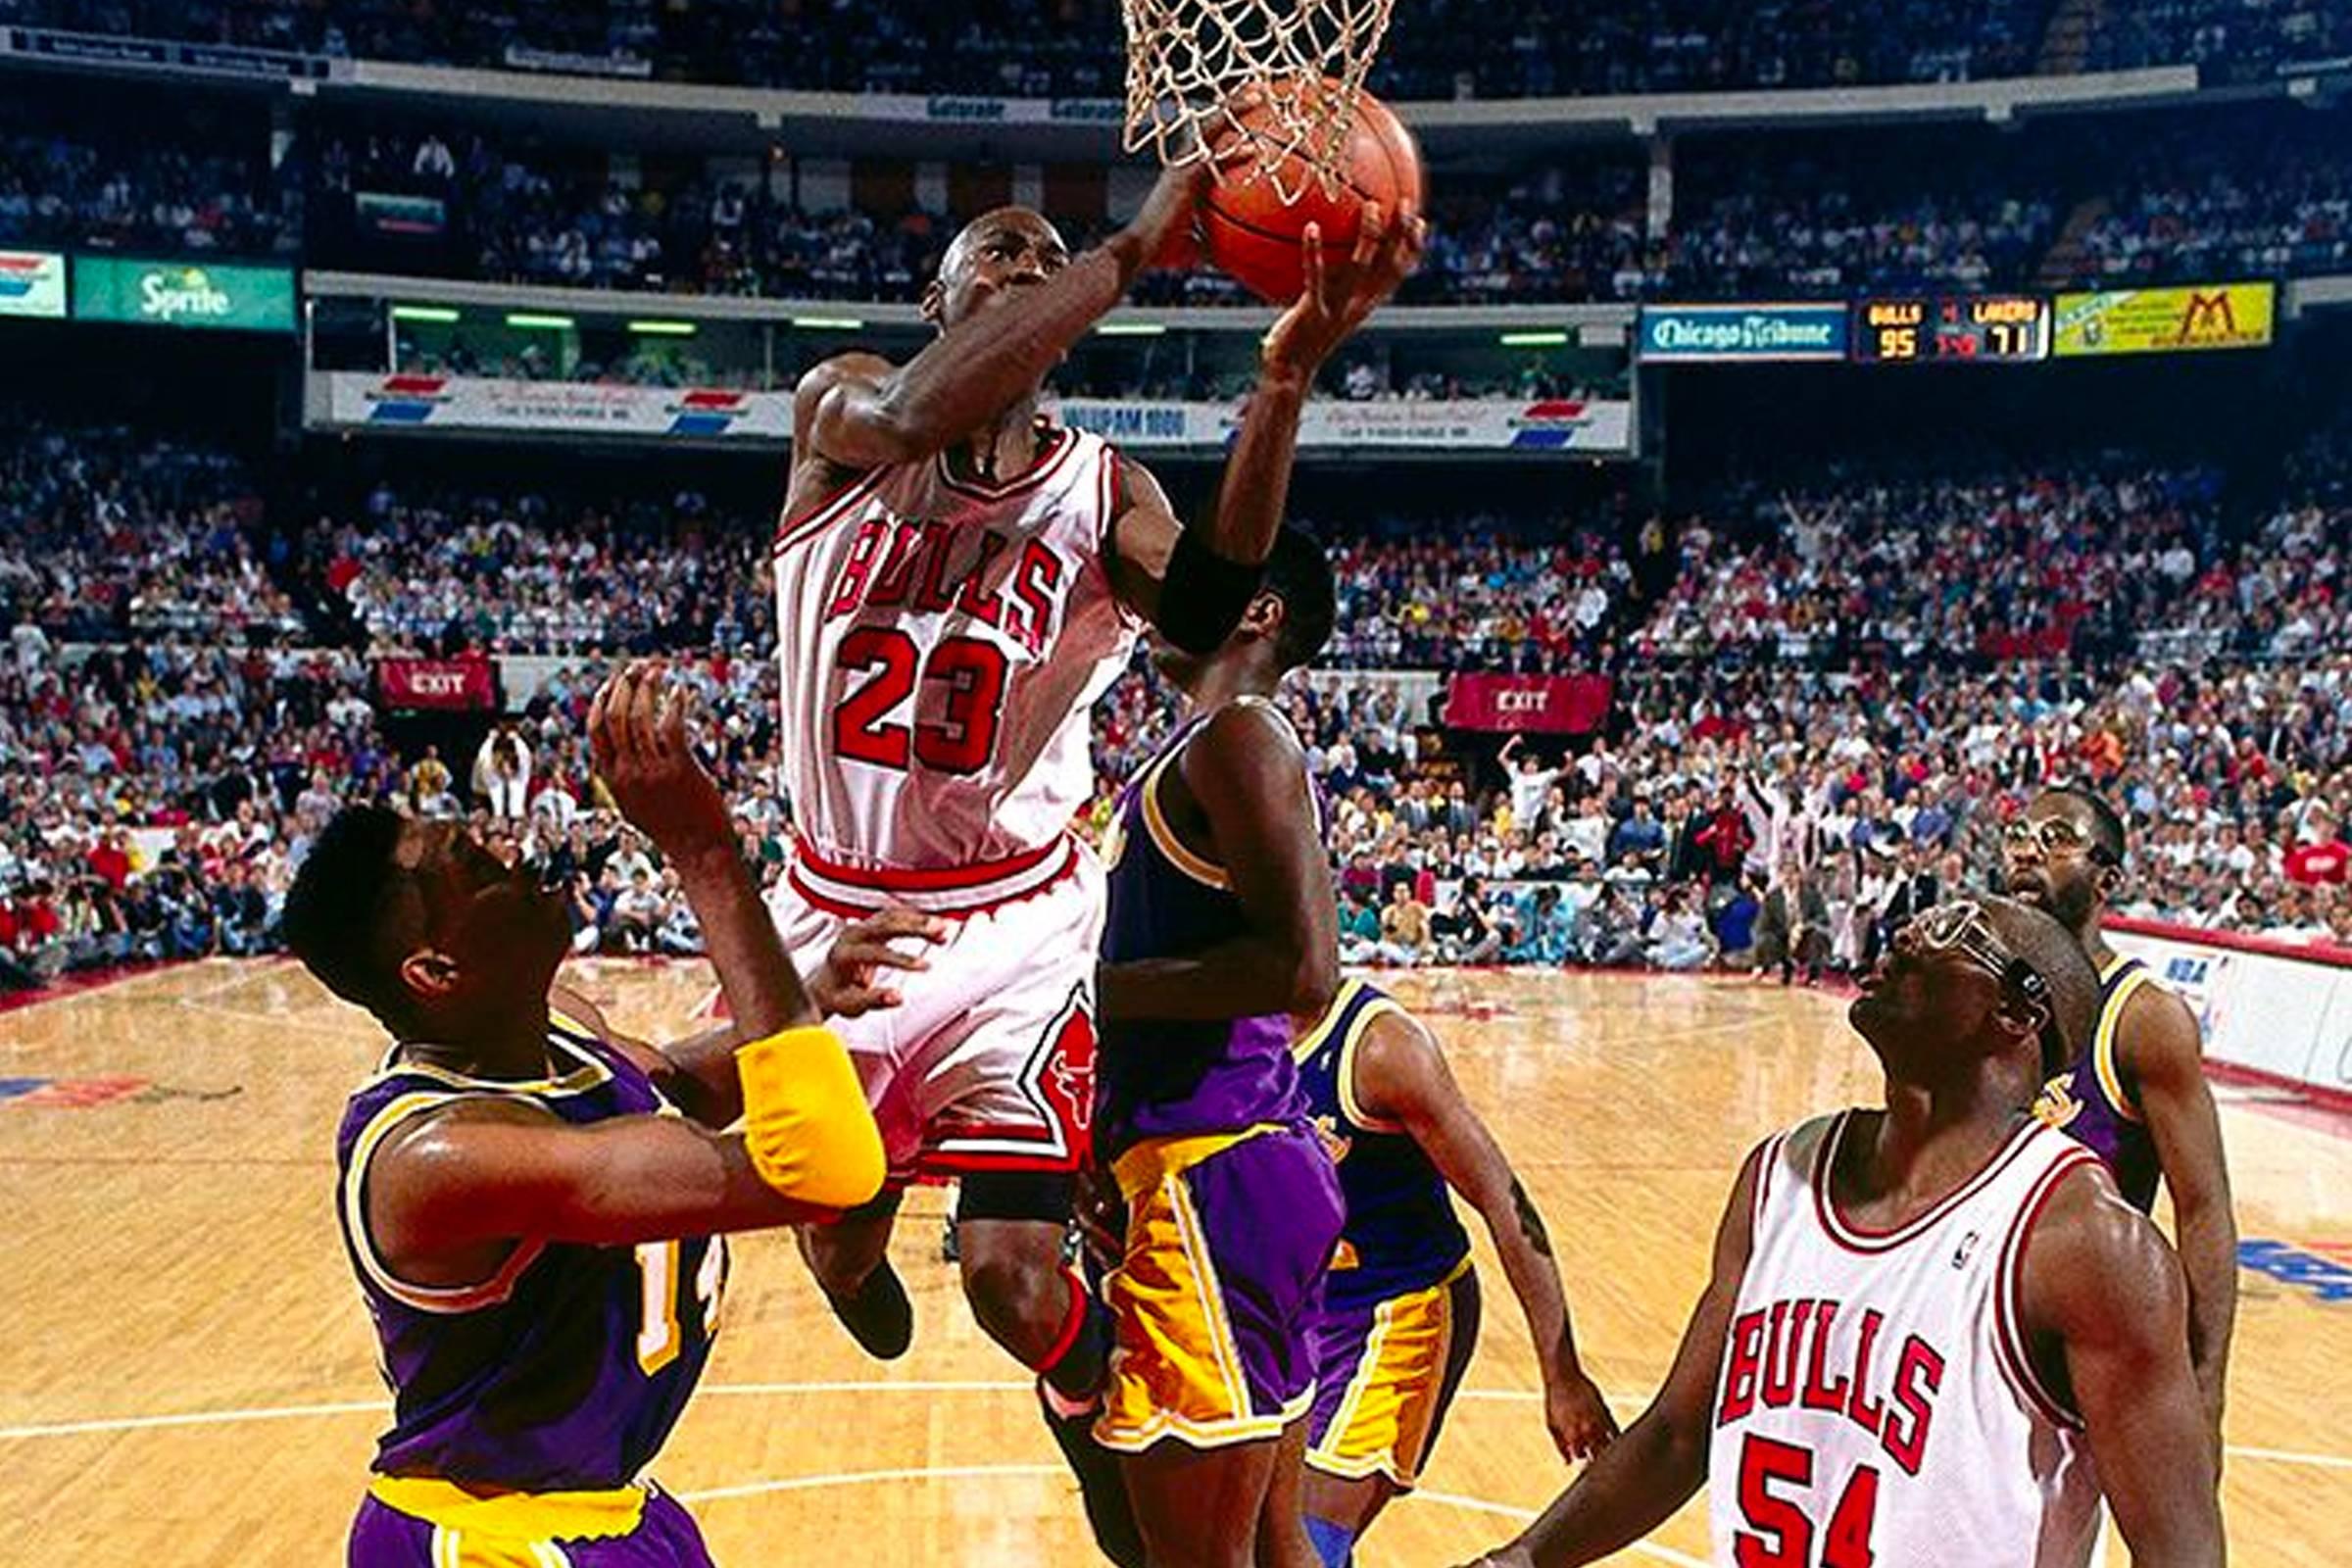 1991 NBA Finals, Game 2